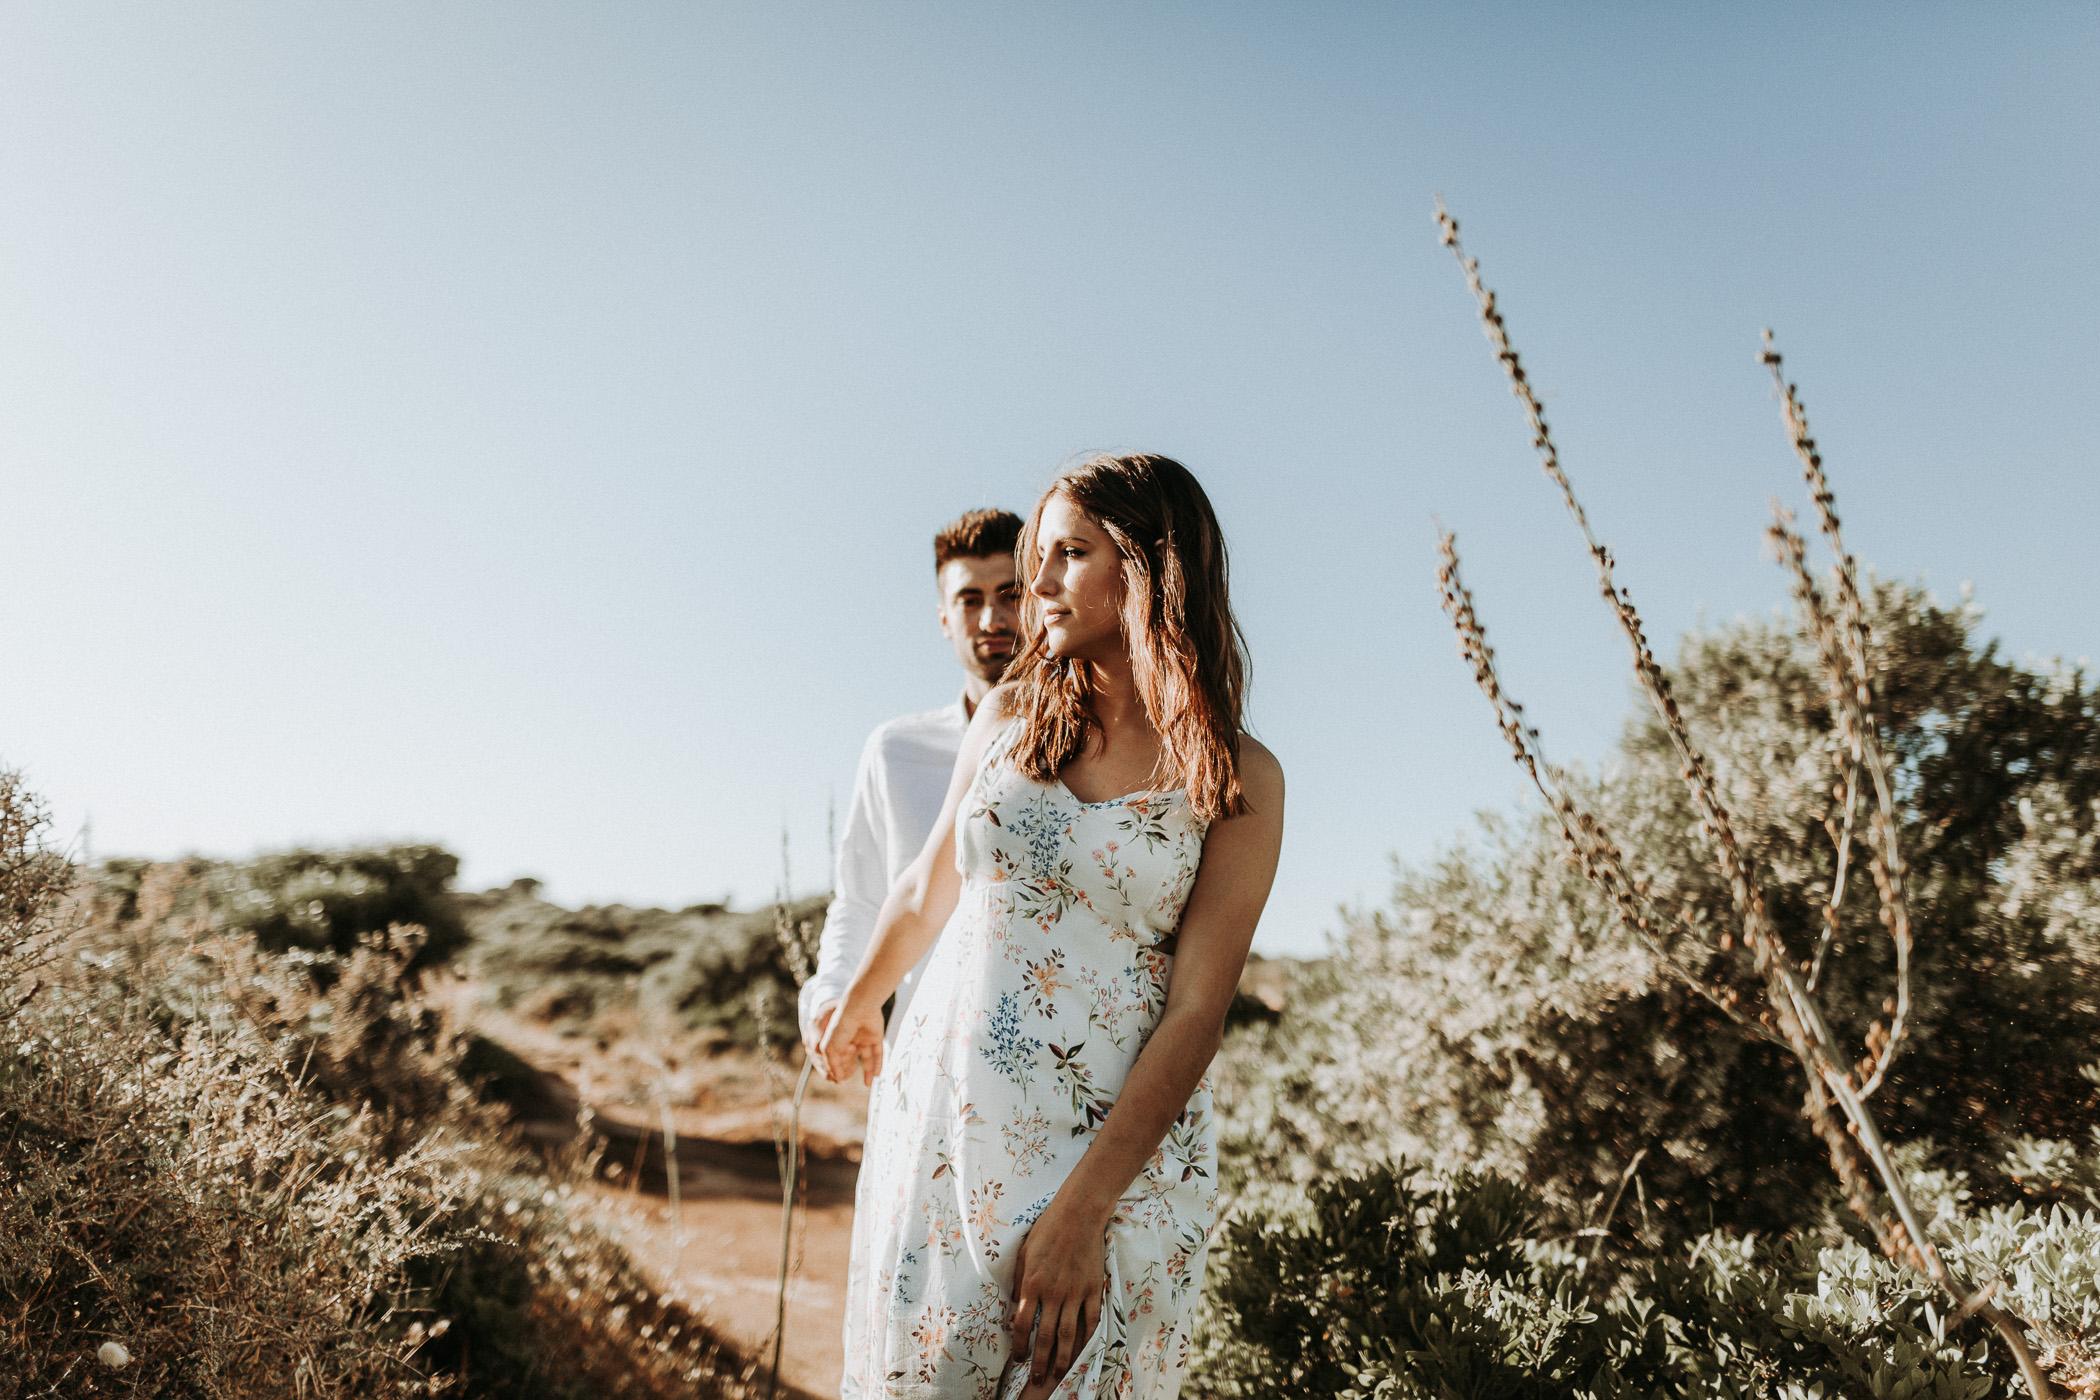 DanielaMarquardtPhotography_wedding_elopement_mallorca_spain_calapi_palma_lauraandtoni_216